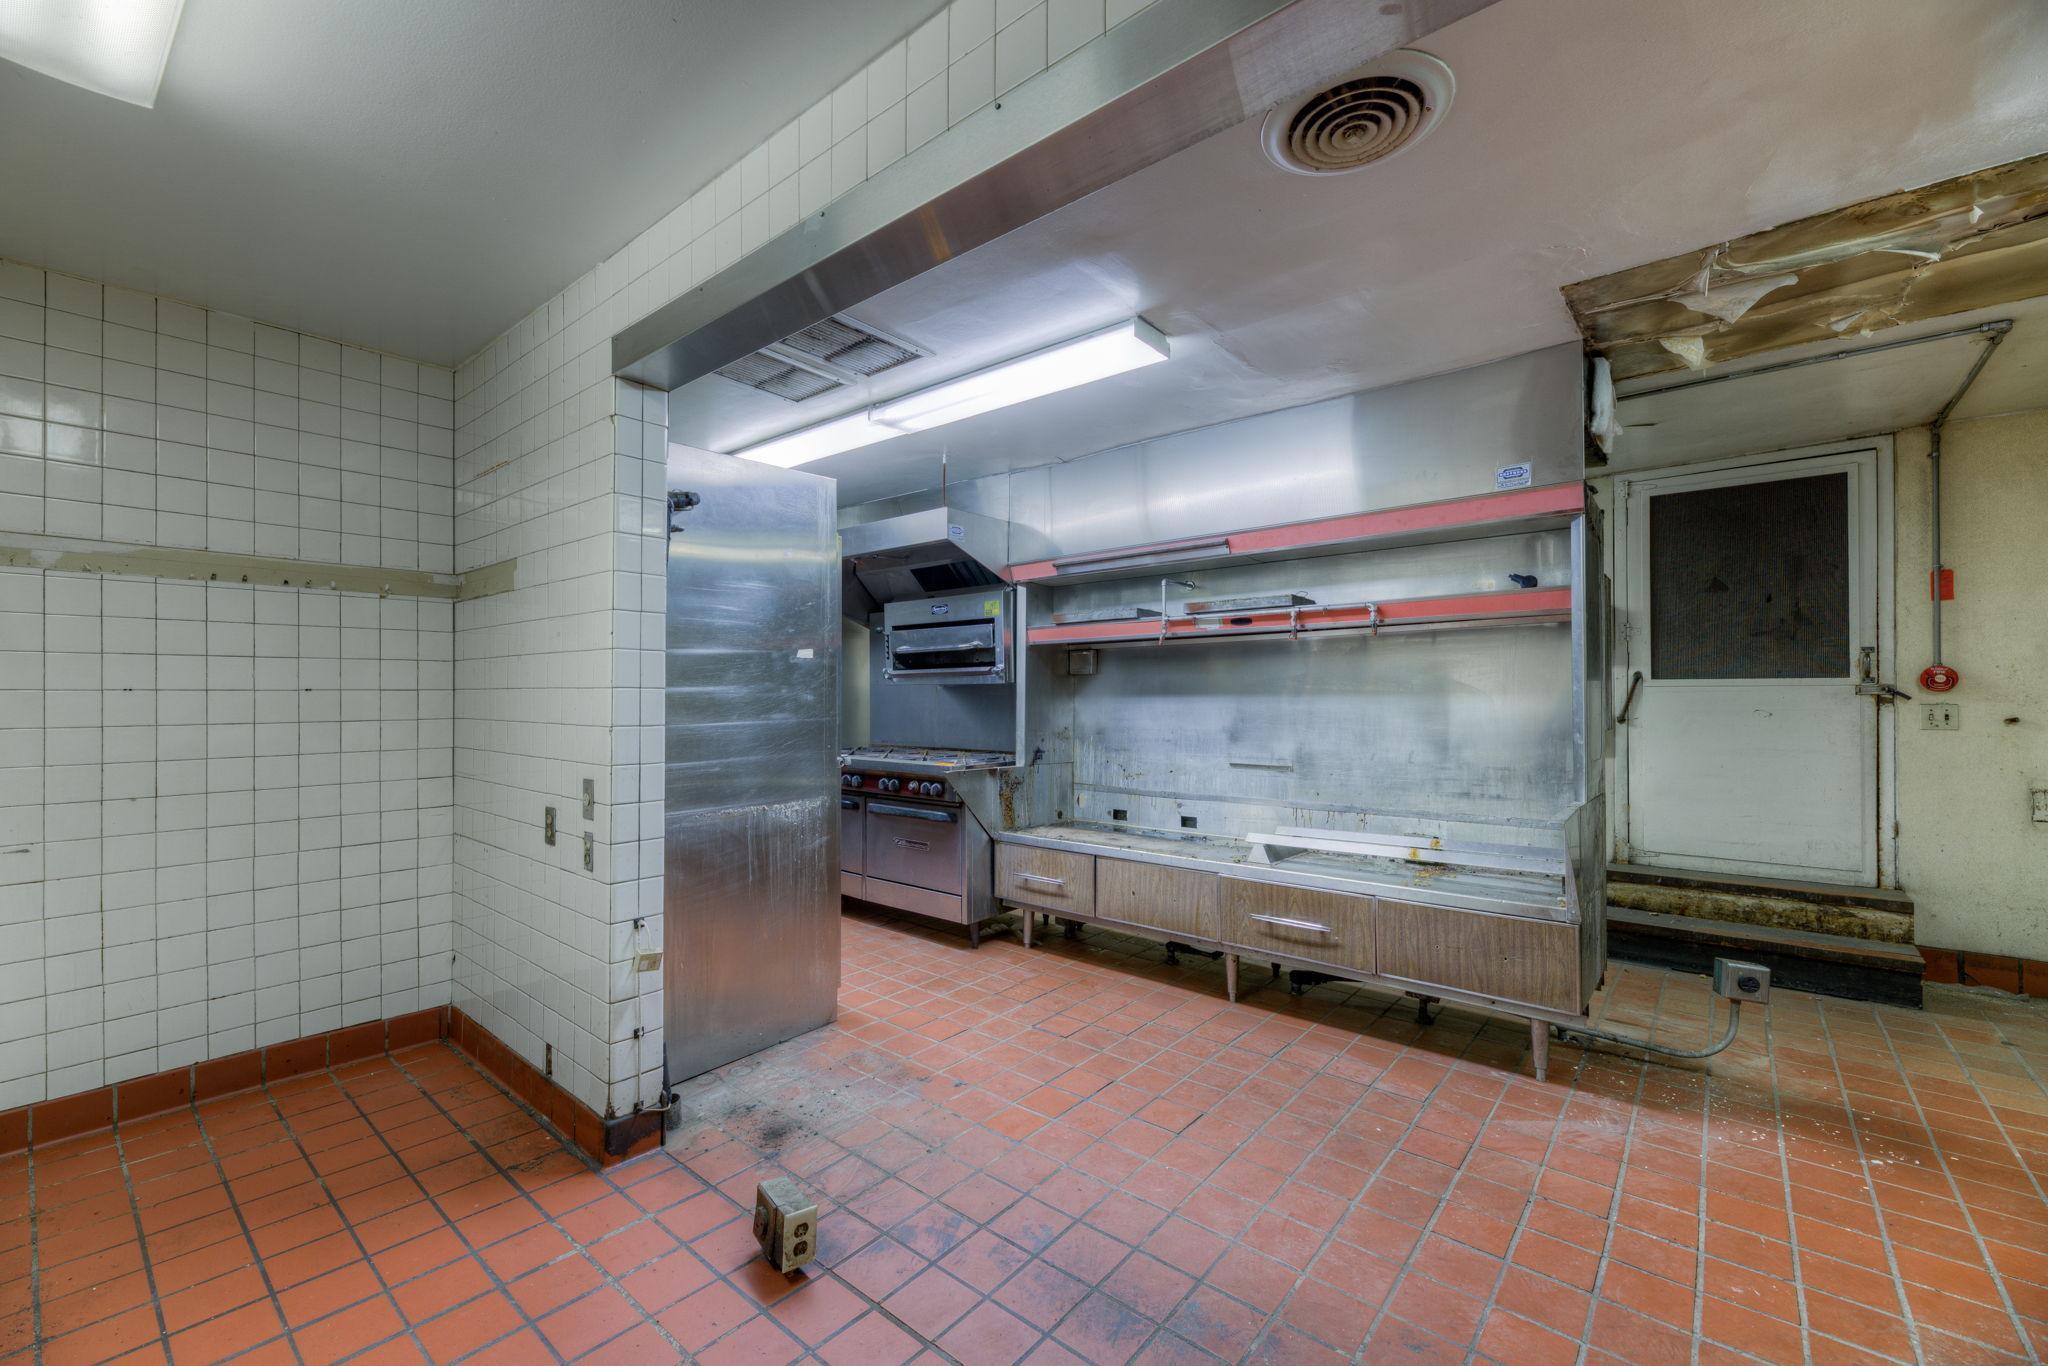 421 - 423 East 7th Street St. Paul-10-web-Interior %3D Kitchen